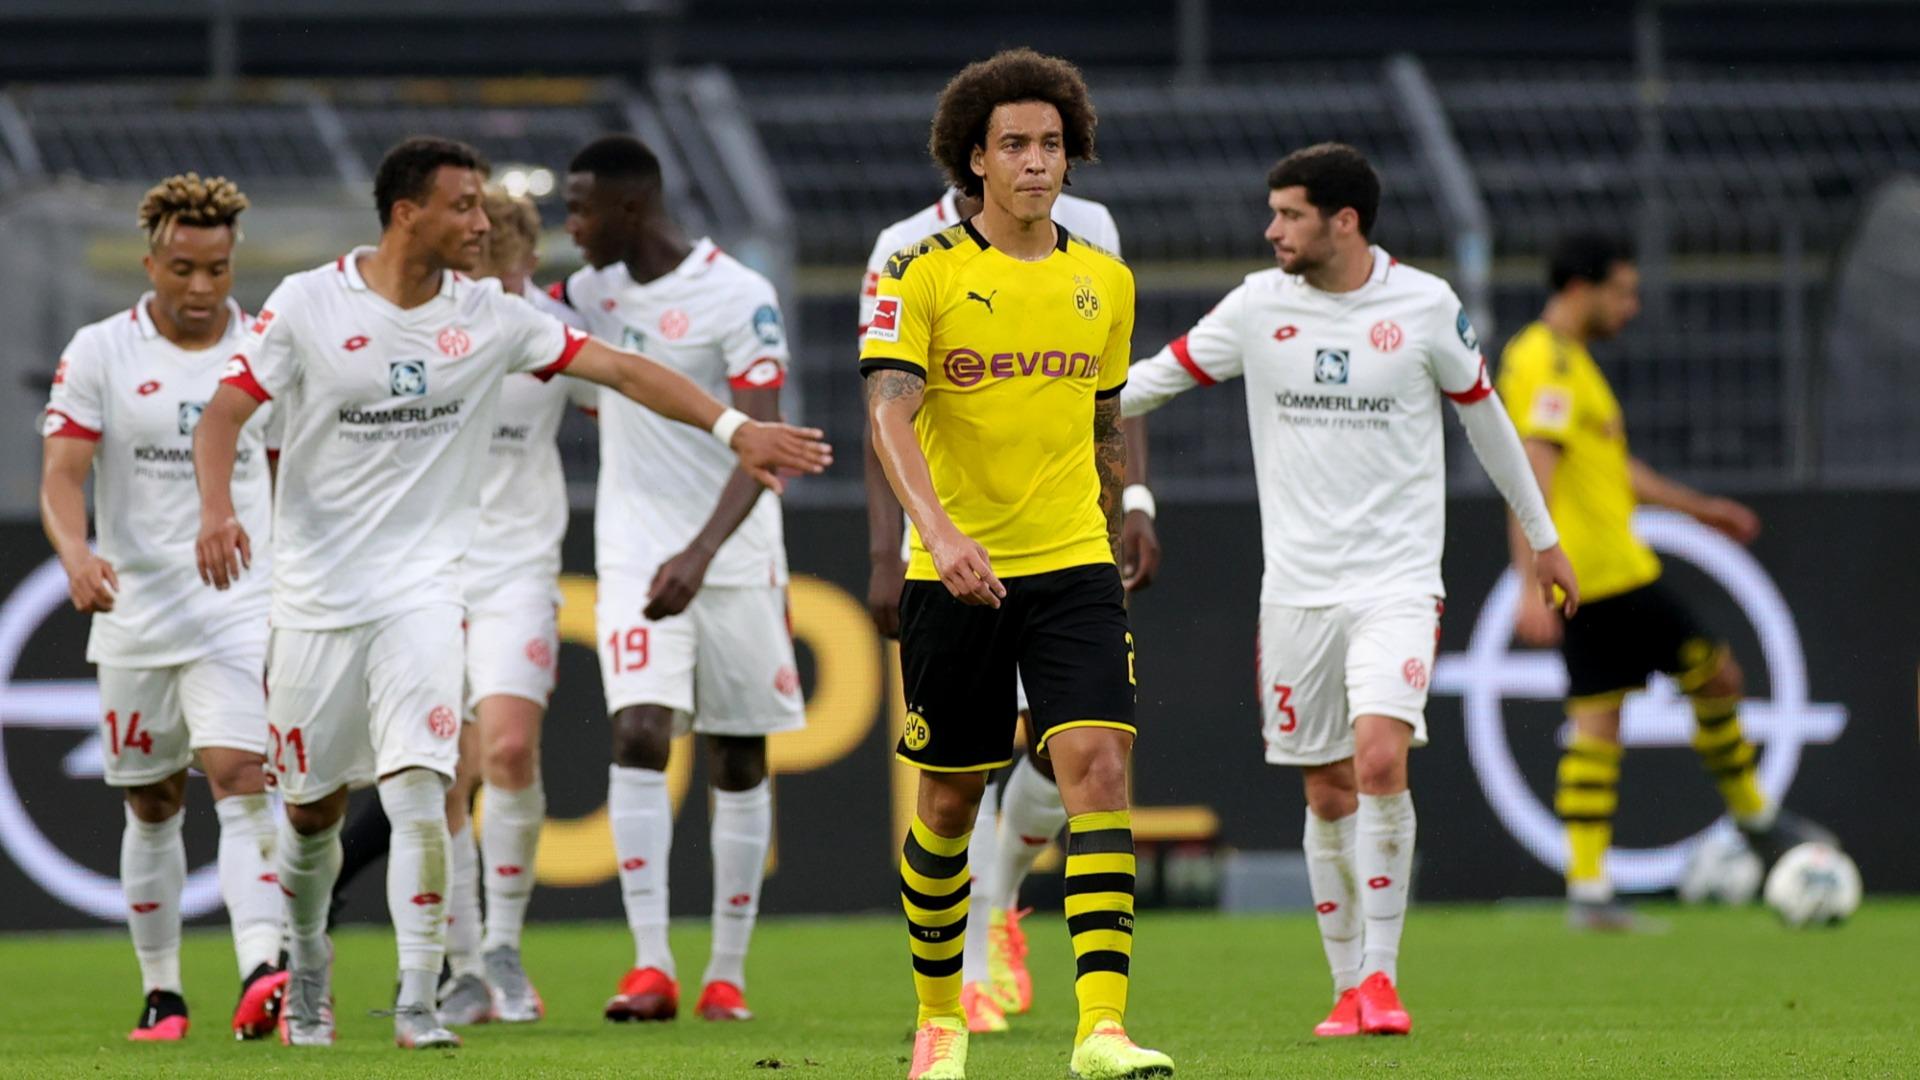 Borussia Dortmund 0-2 Mainz: Shock loss has Favre's men looking over their shoulder